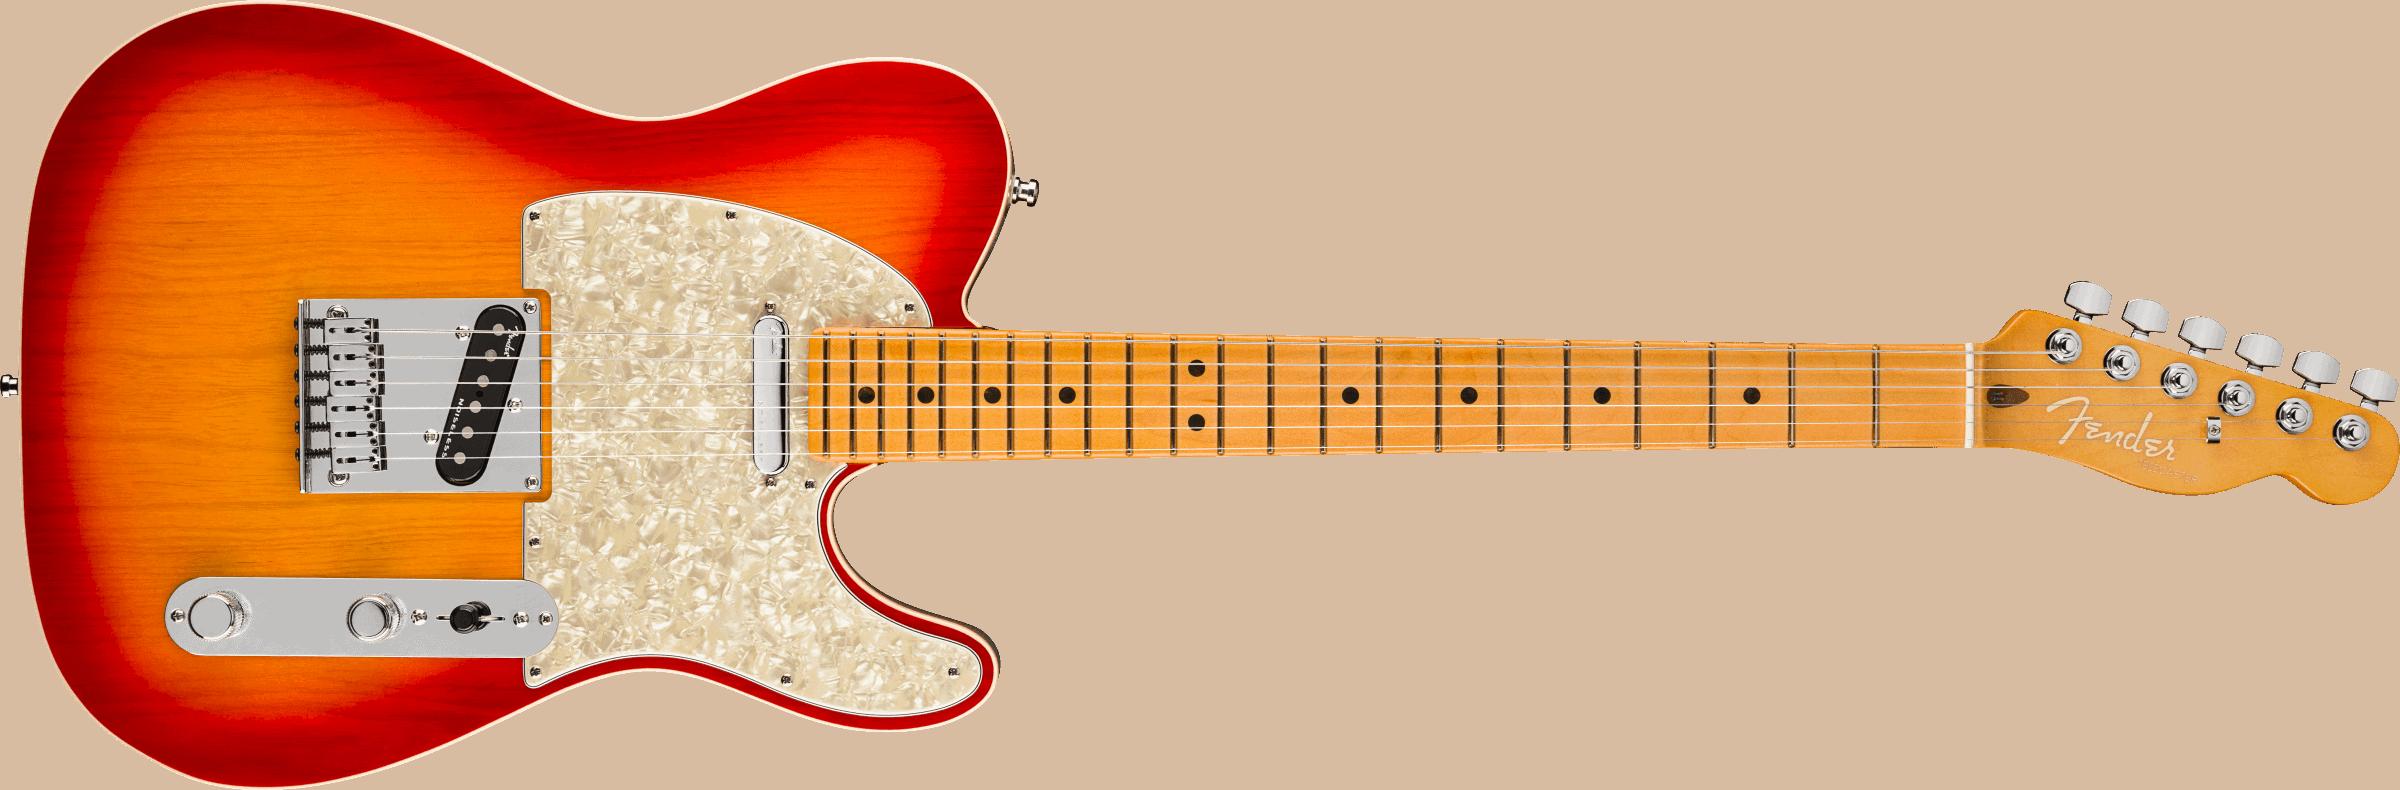 Fender American Ultra Telecaster®, Maple Fingerboard, Plasma Red Burst